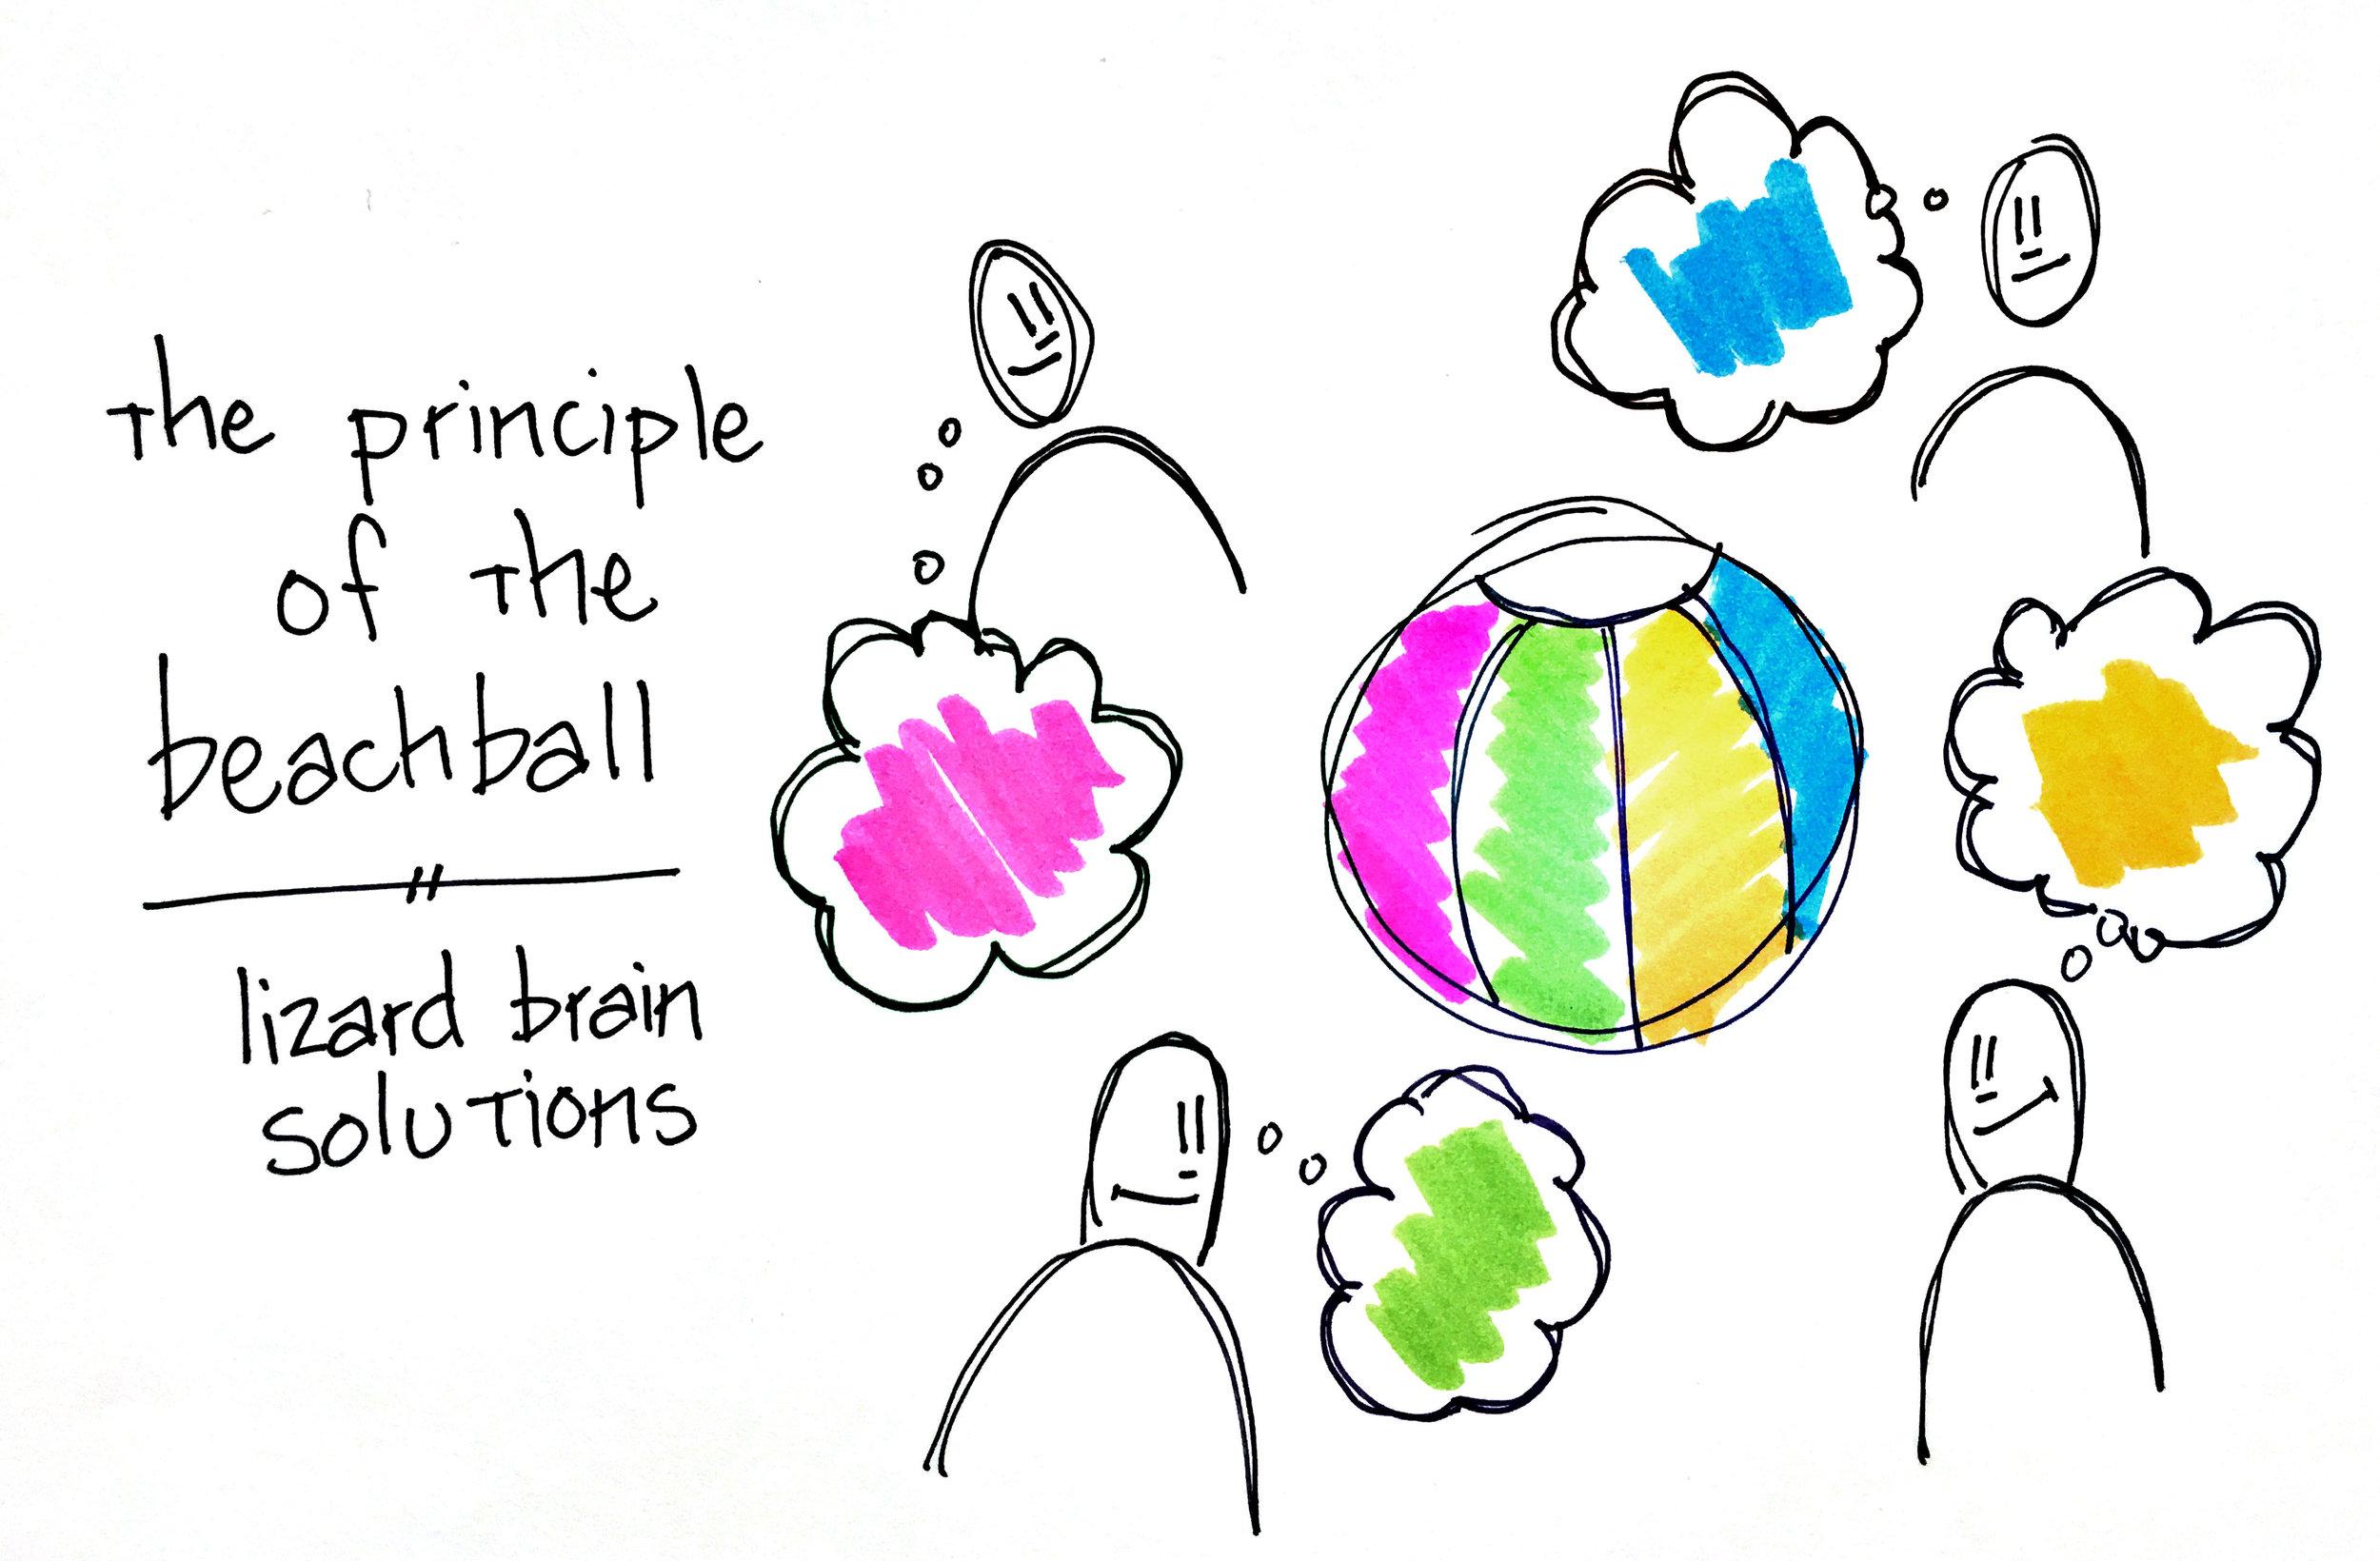 Principle of the Beachball